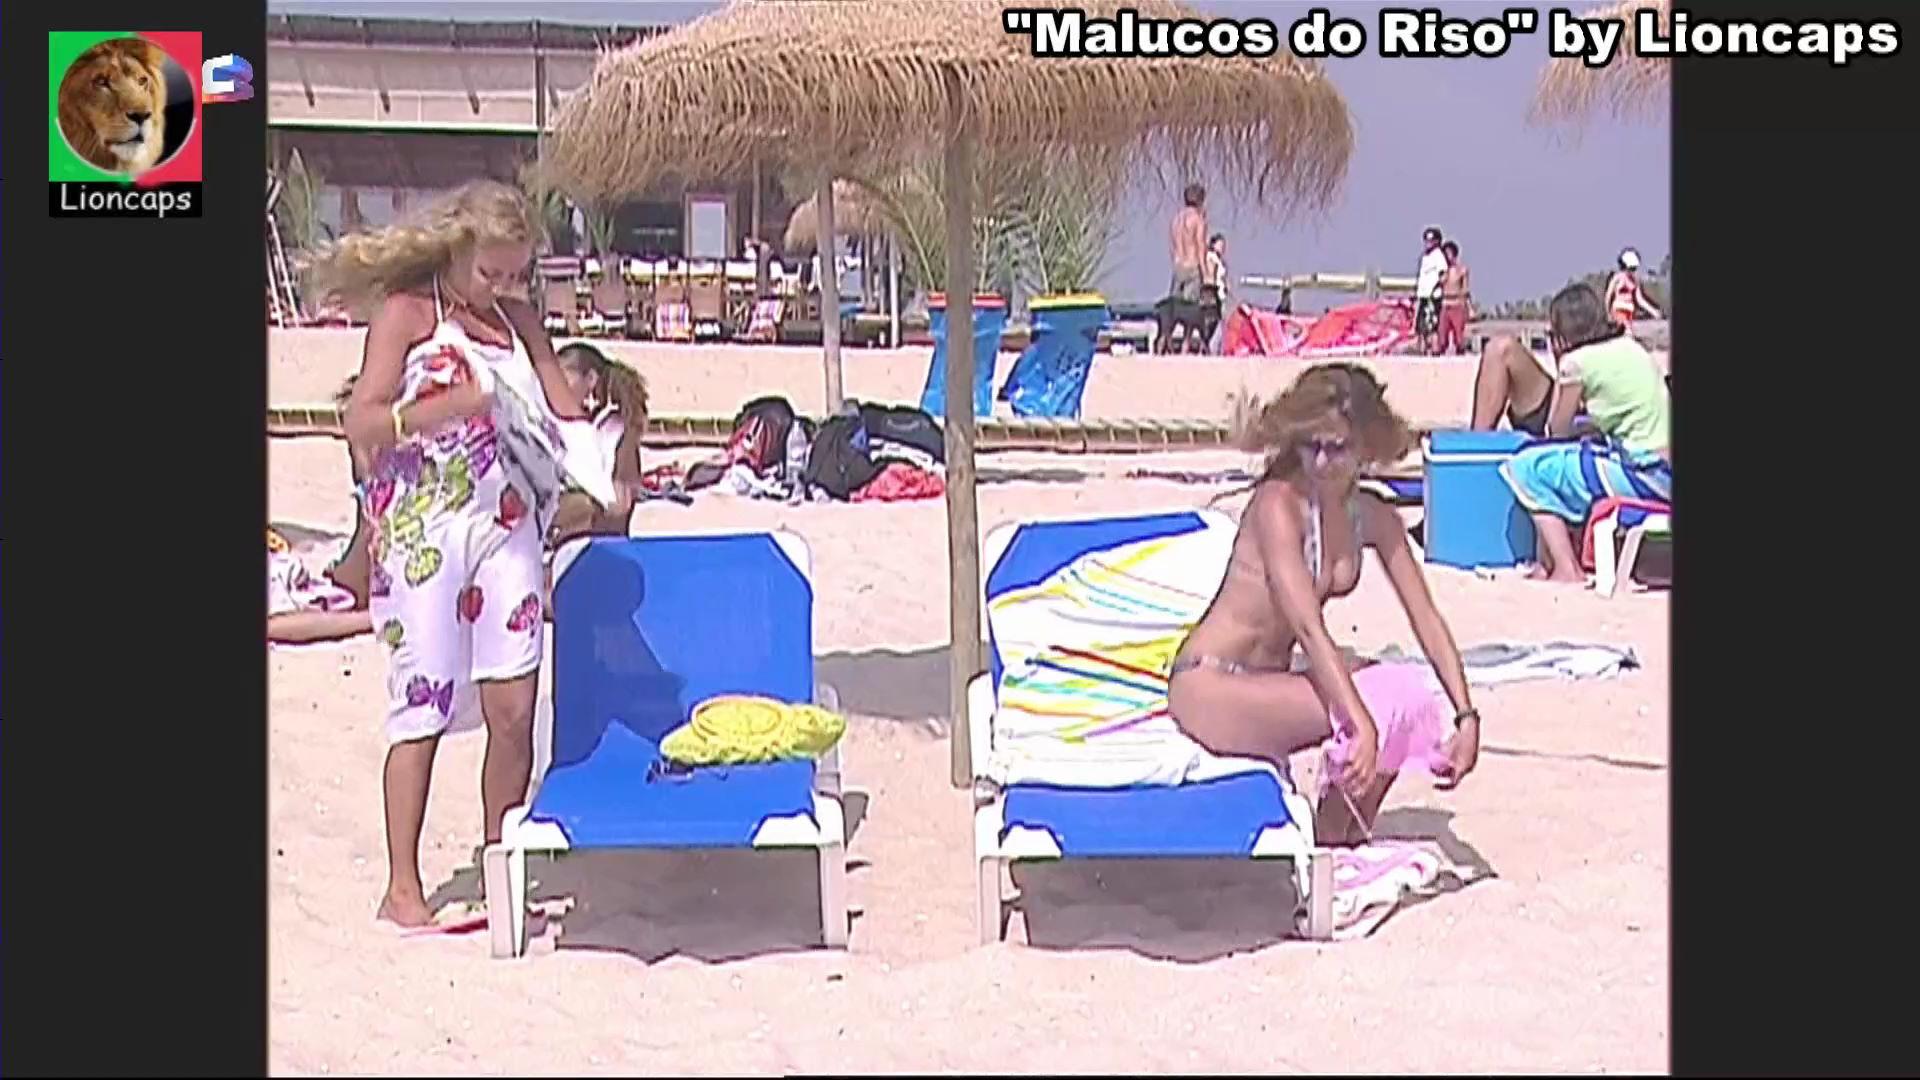 475187358_malucos_riso_alda_gomes_vs190malucos_riso_602_15088_122_516lo.JPG